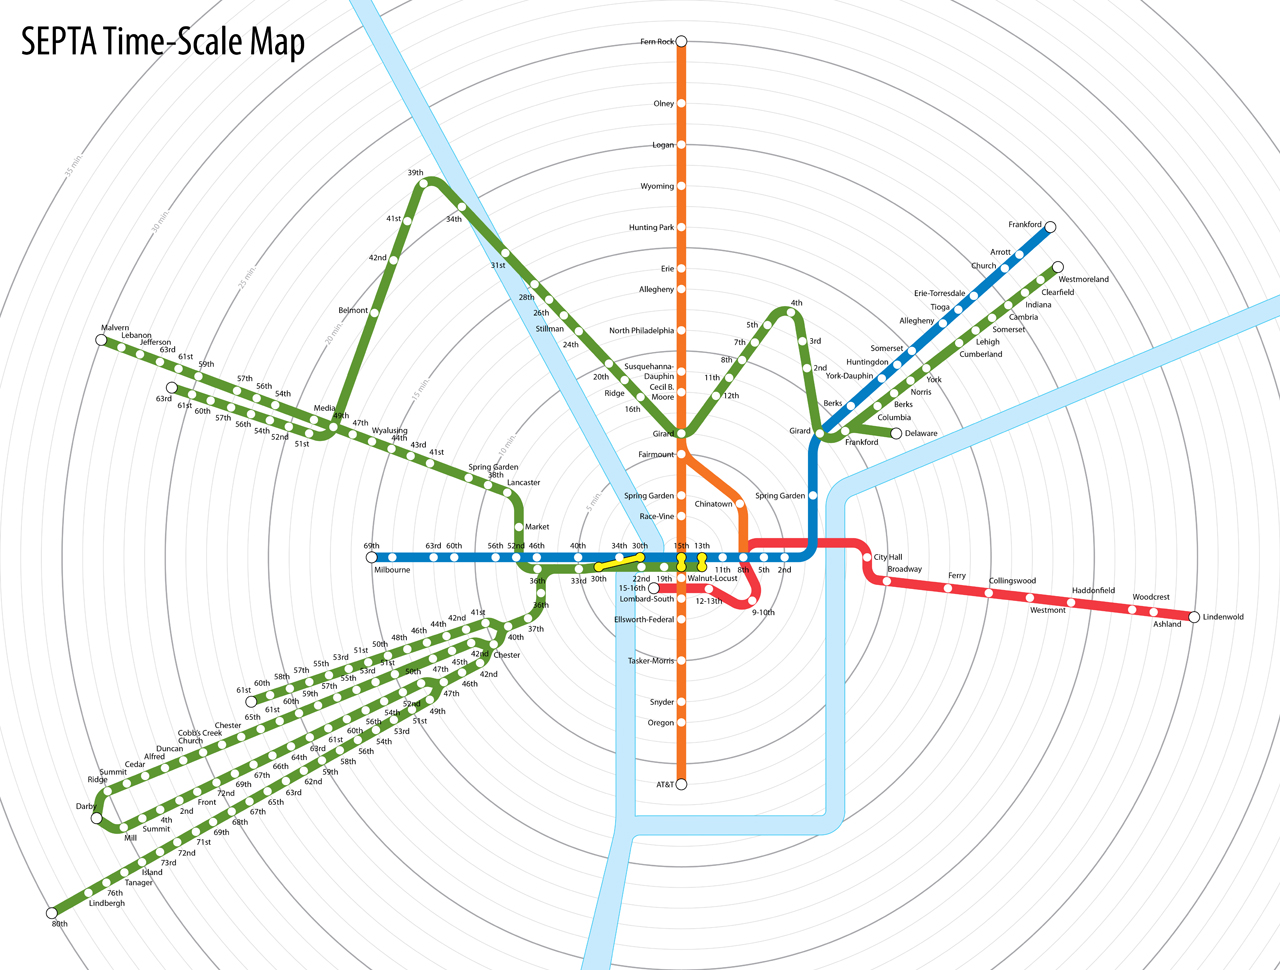 Time-Scale Transit Map of Philadelphia – Munson's City on north philadelphia pa street map, philadelphia rail system map, philadelphia metro area map, philadelphia tram map, philadelphia art museum district map, philadelphia trolley routes, philadelphia hospital map, philadelphia city hall, philadelphia light rail map, center city philadelphia zip code map, philadelphia bridge map, philadelphia broad street run map, philadelphia commuter rail map, philadelphia public transport map, philadelphia public transit map, philadelphia bus, center city philadelphia pennsylvania map, philadelphia trolley system, philadelphia trains map, philadelphia concourse,